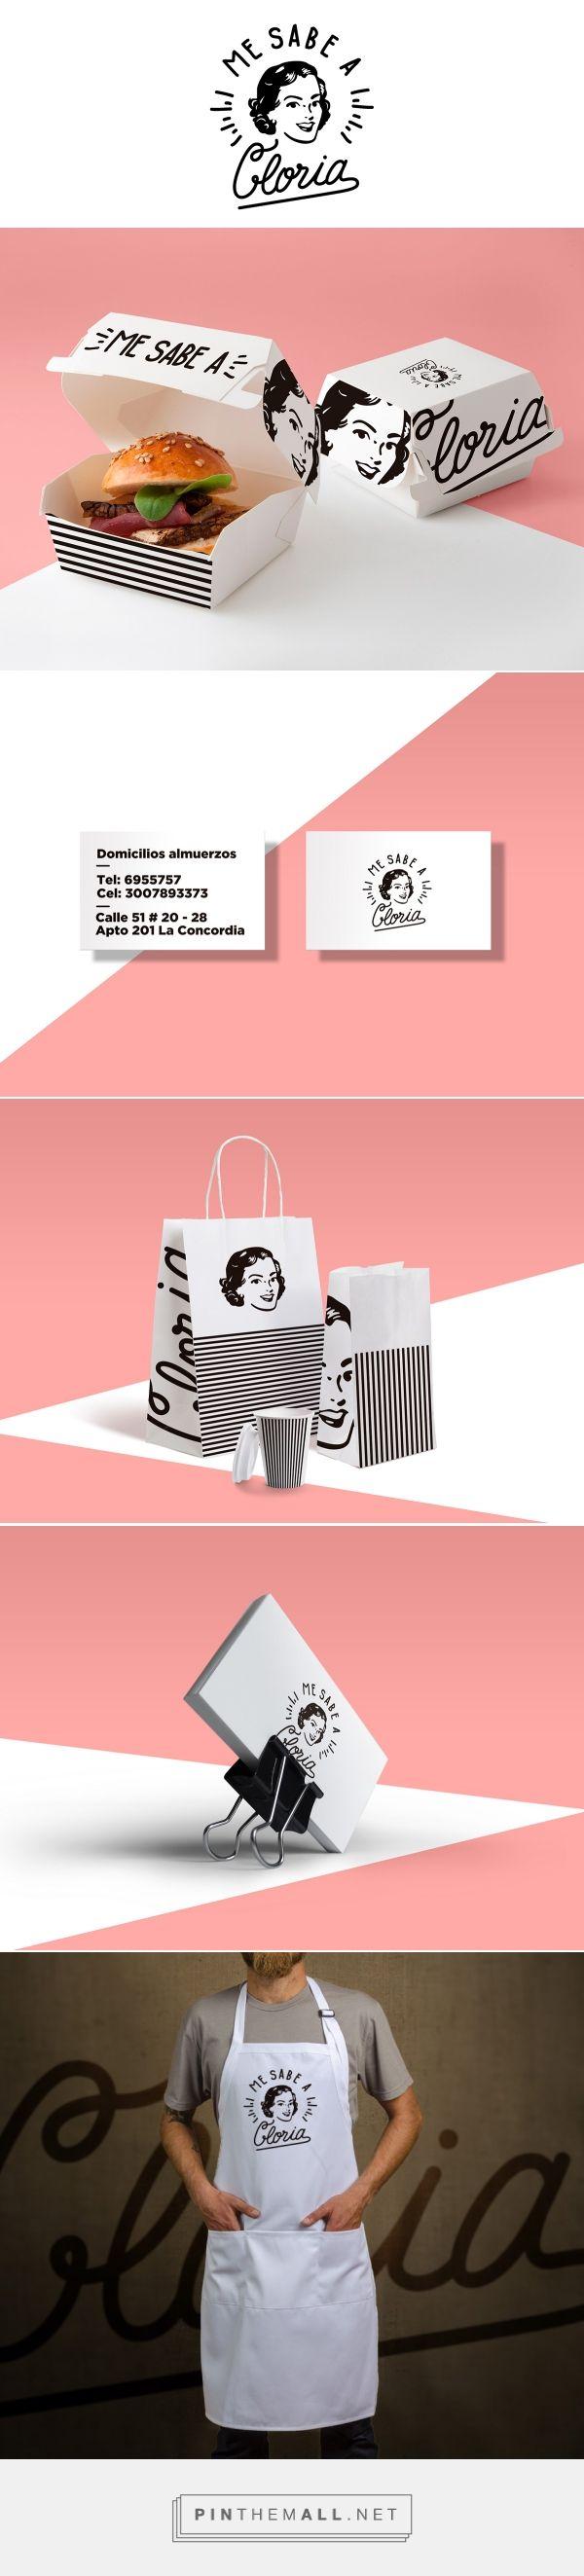 Me sabe a Gloria Branding on Behance   Fivestar Branding – Design and Branding Agency & Inspiration Gallery